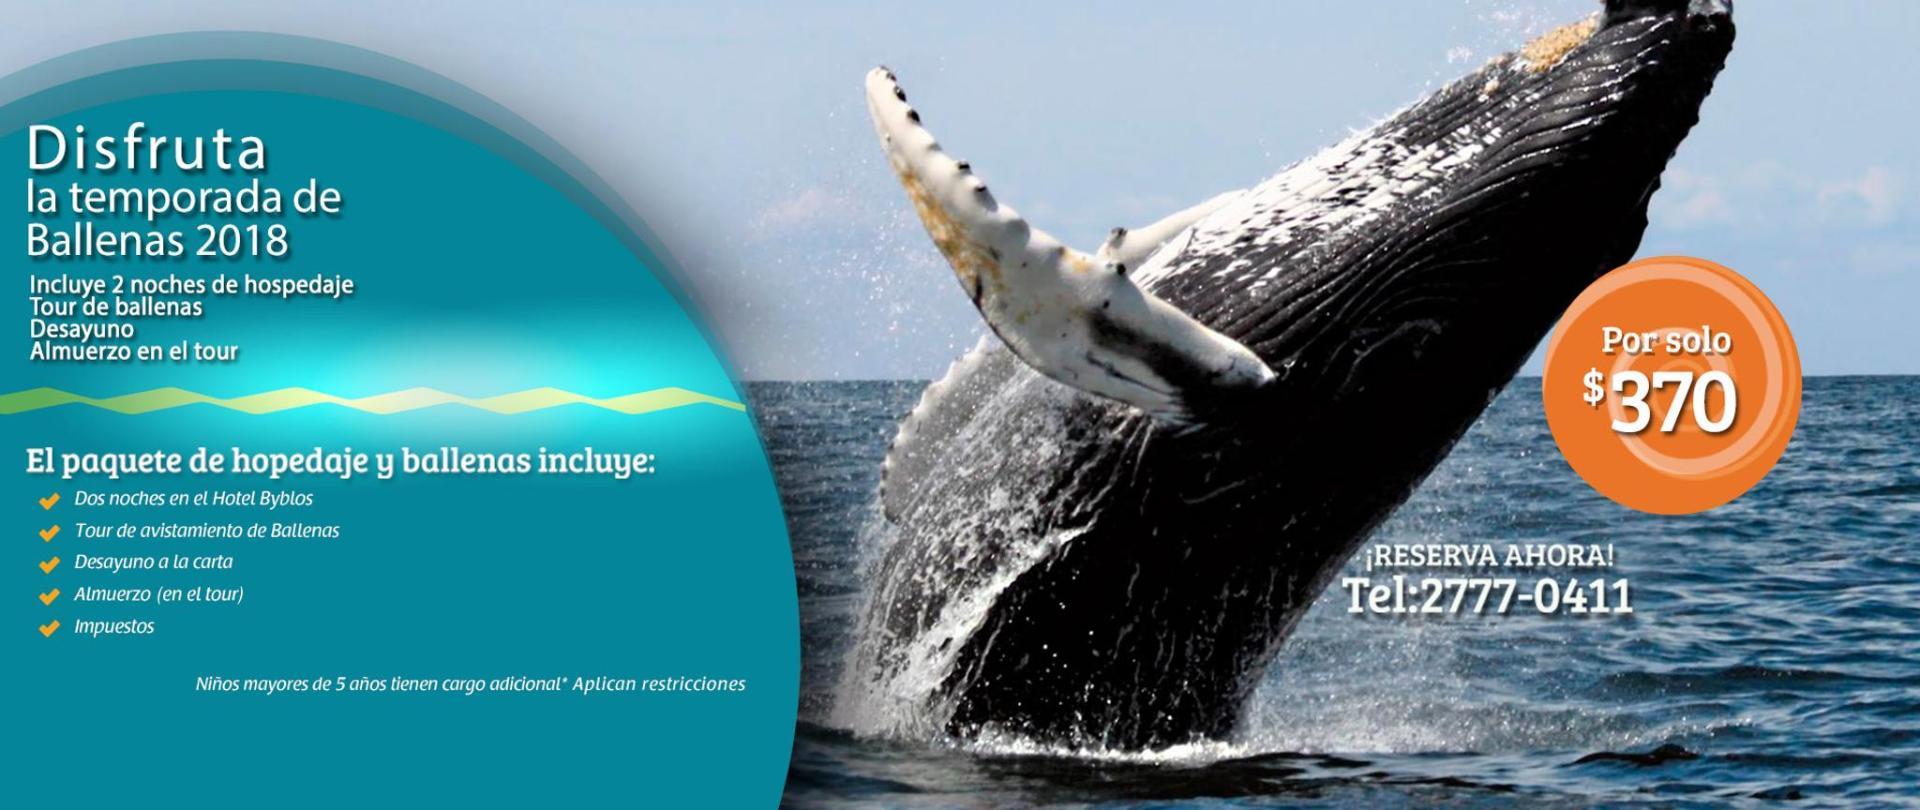 portada-ballenas.jpg